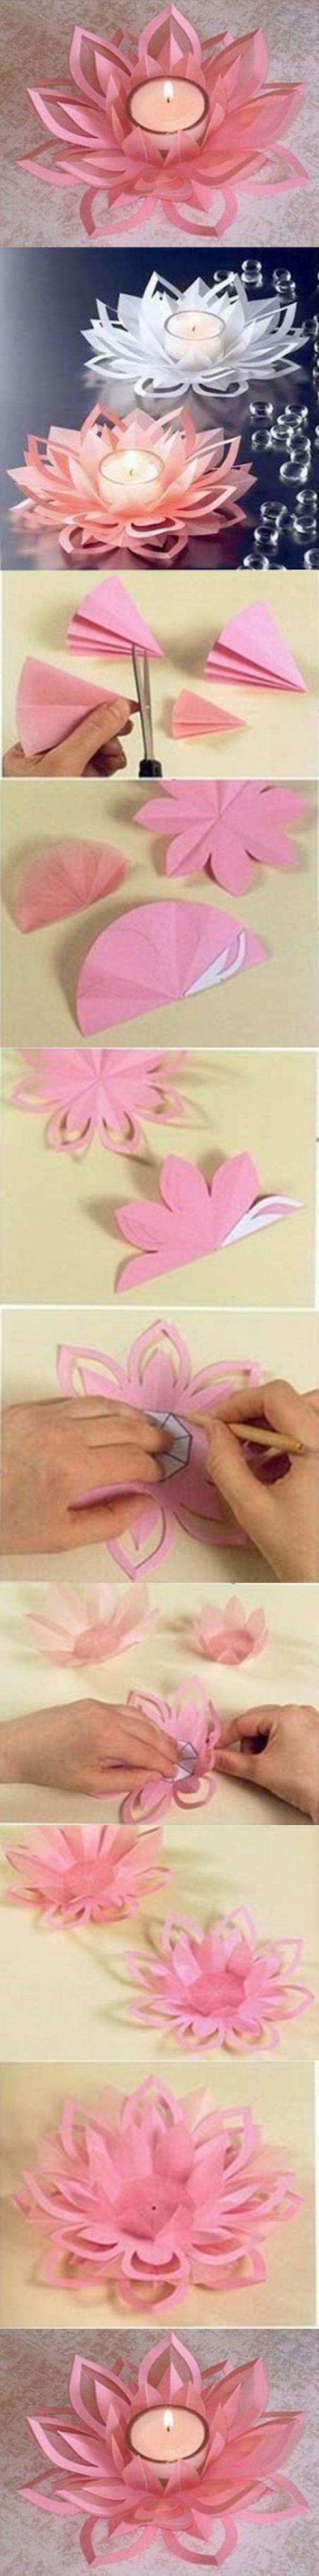 DIY Paper Lotus Candlestick 2